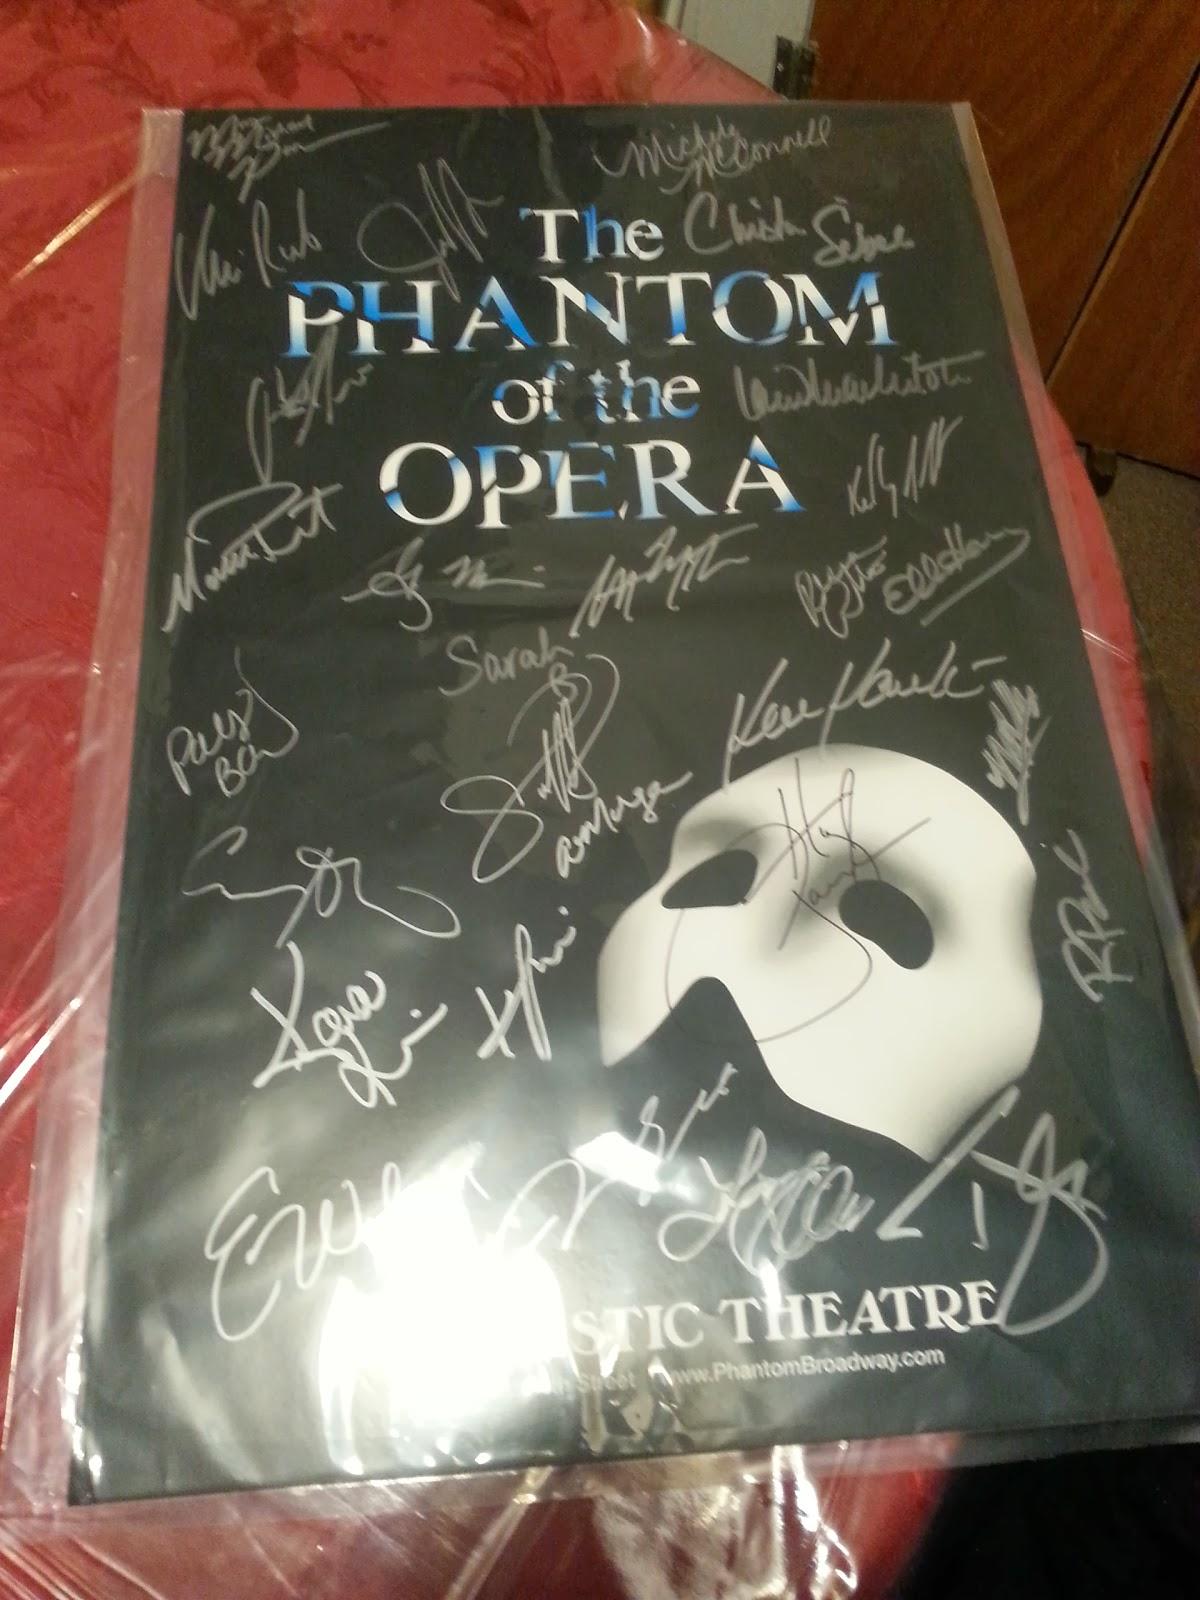 Diary of a Phantom PHan!: Phantom of the Opera #52 NOTES